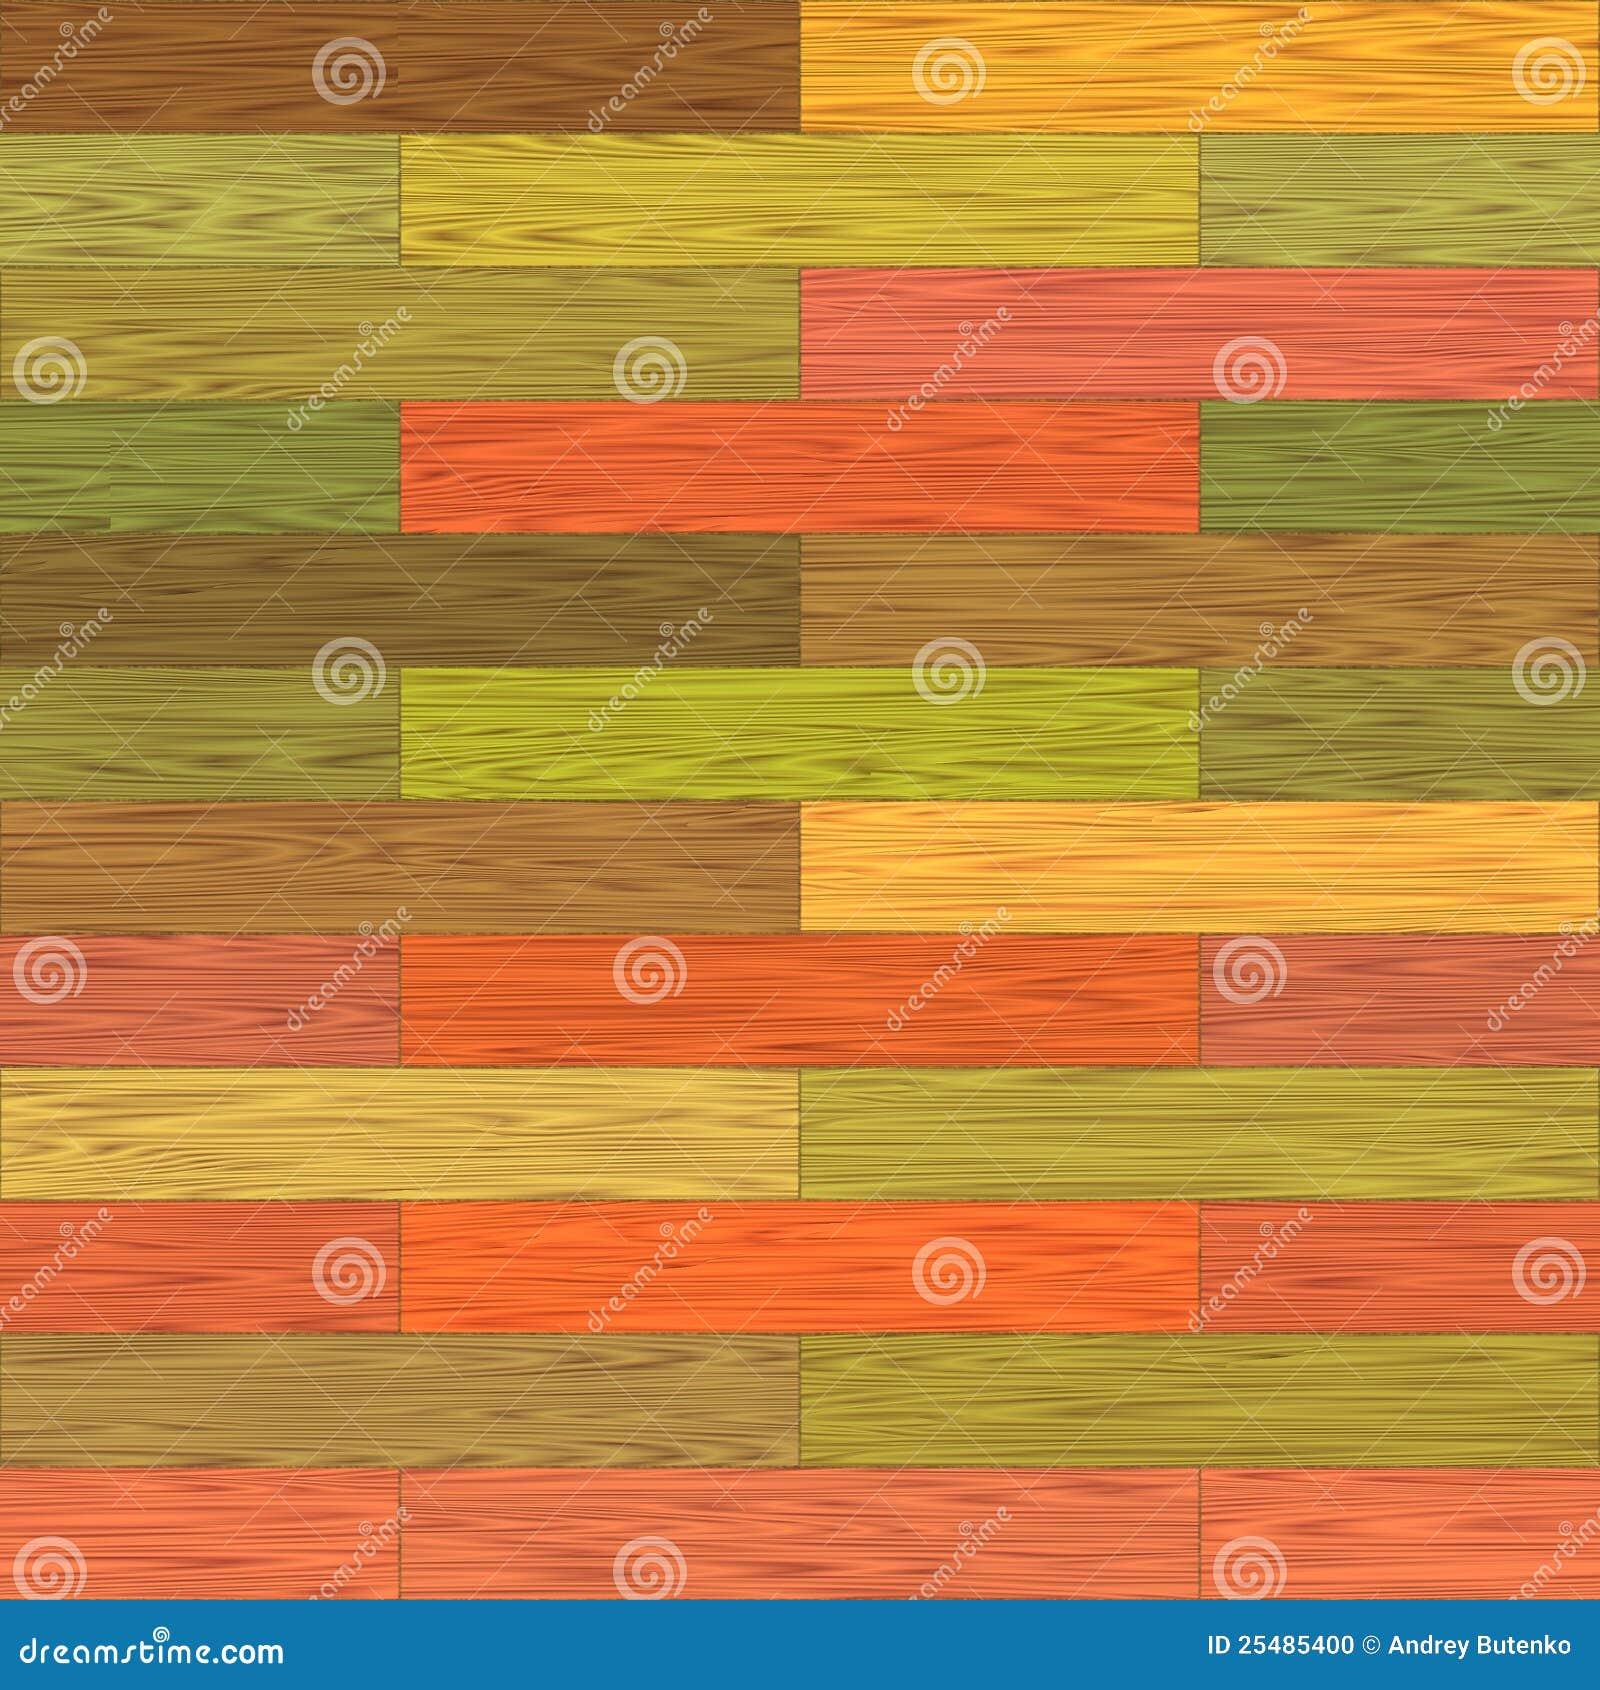 multicolor parquet stock photo image 25485400. Black Bedroom Furniture Sets. Home Design Ideas